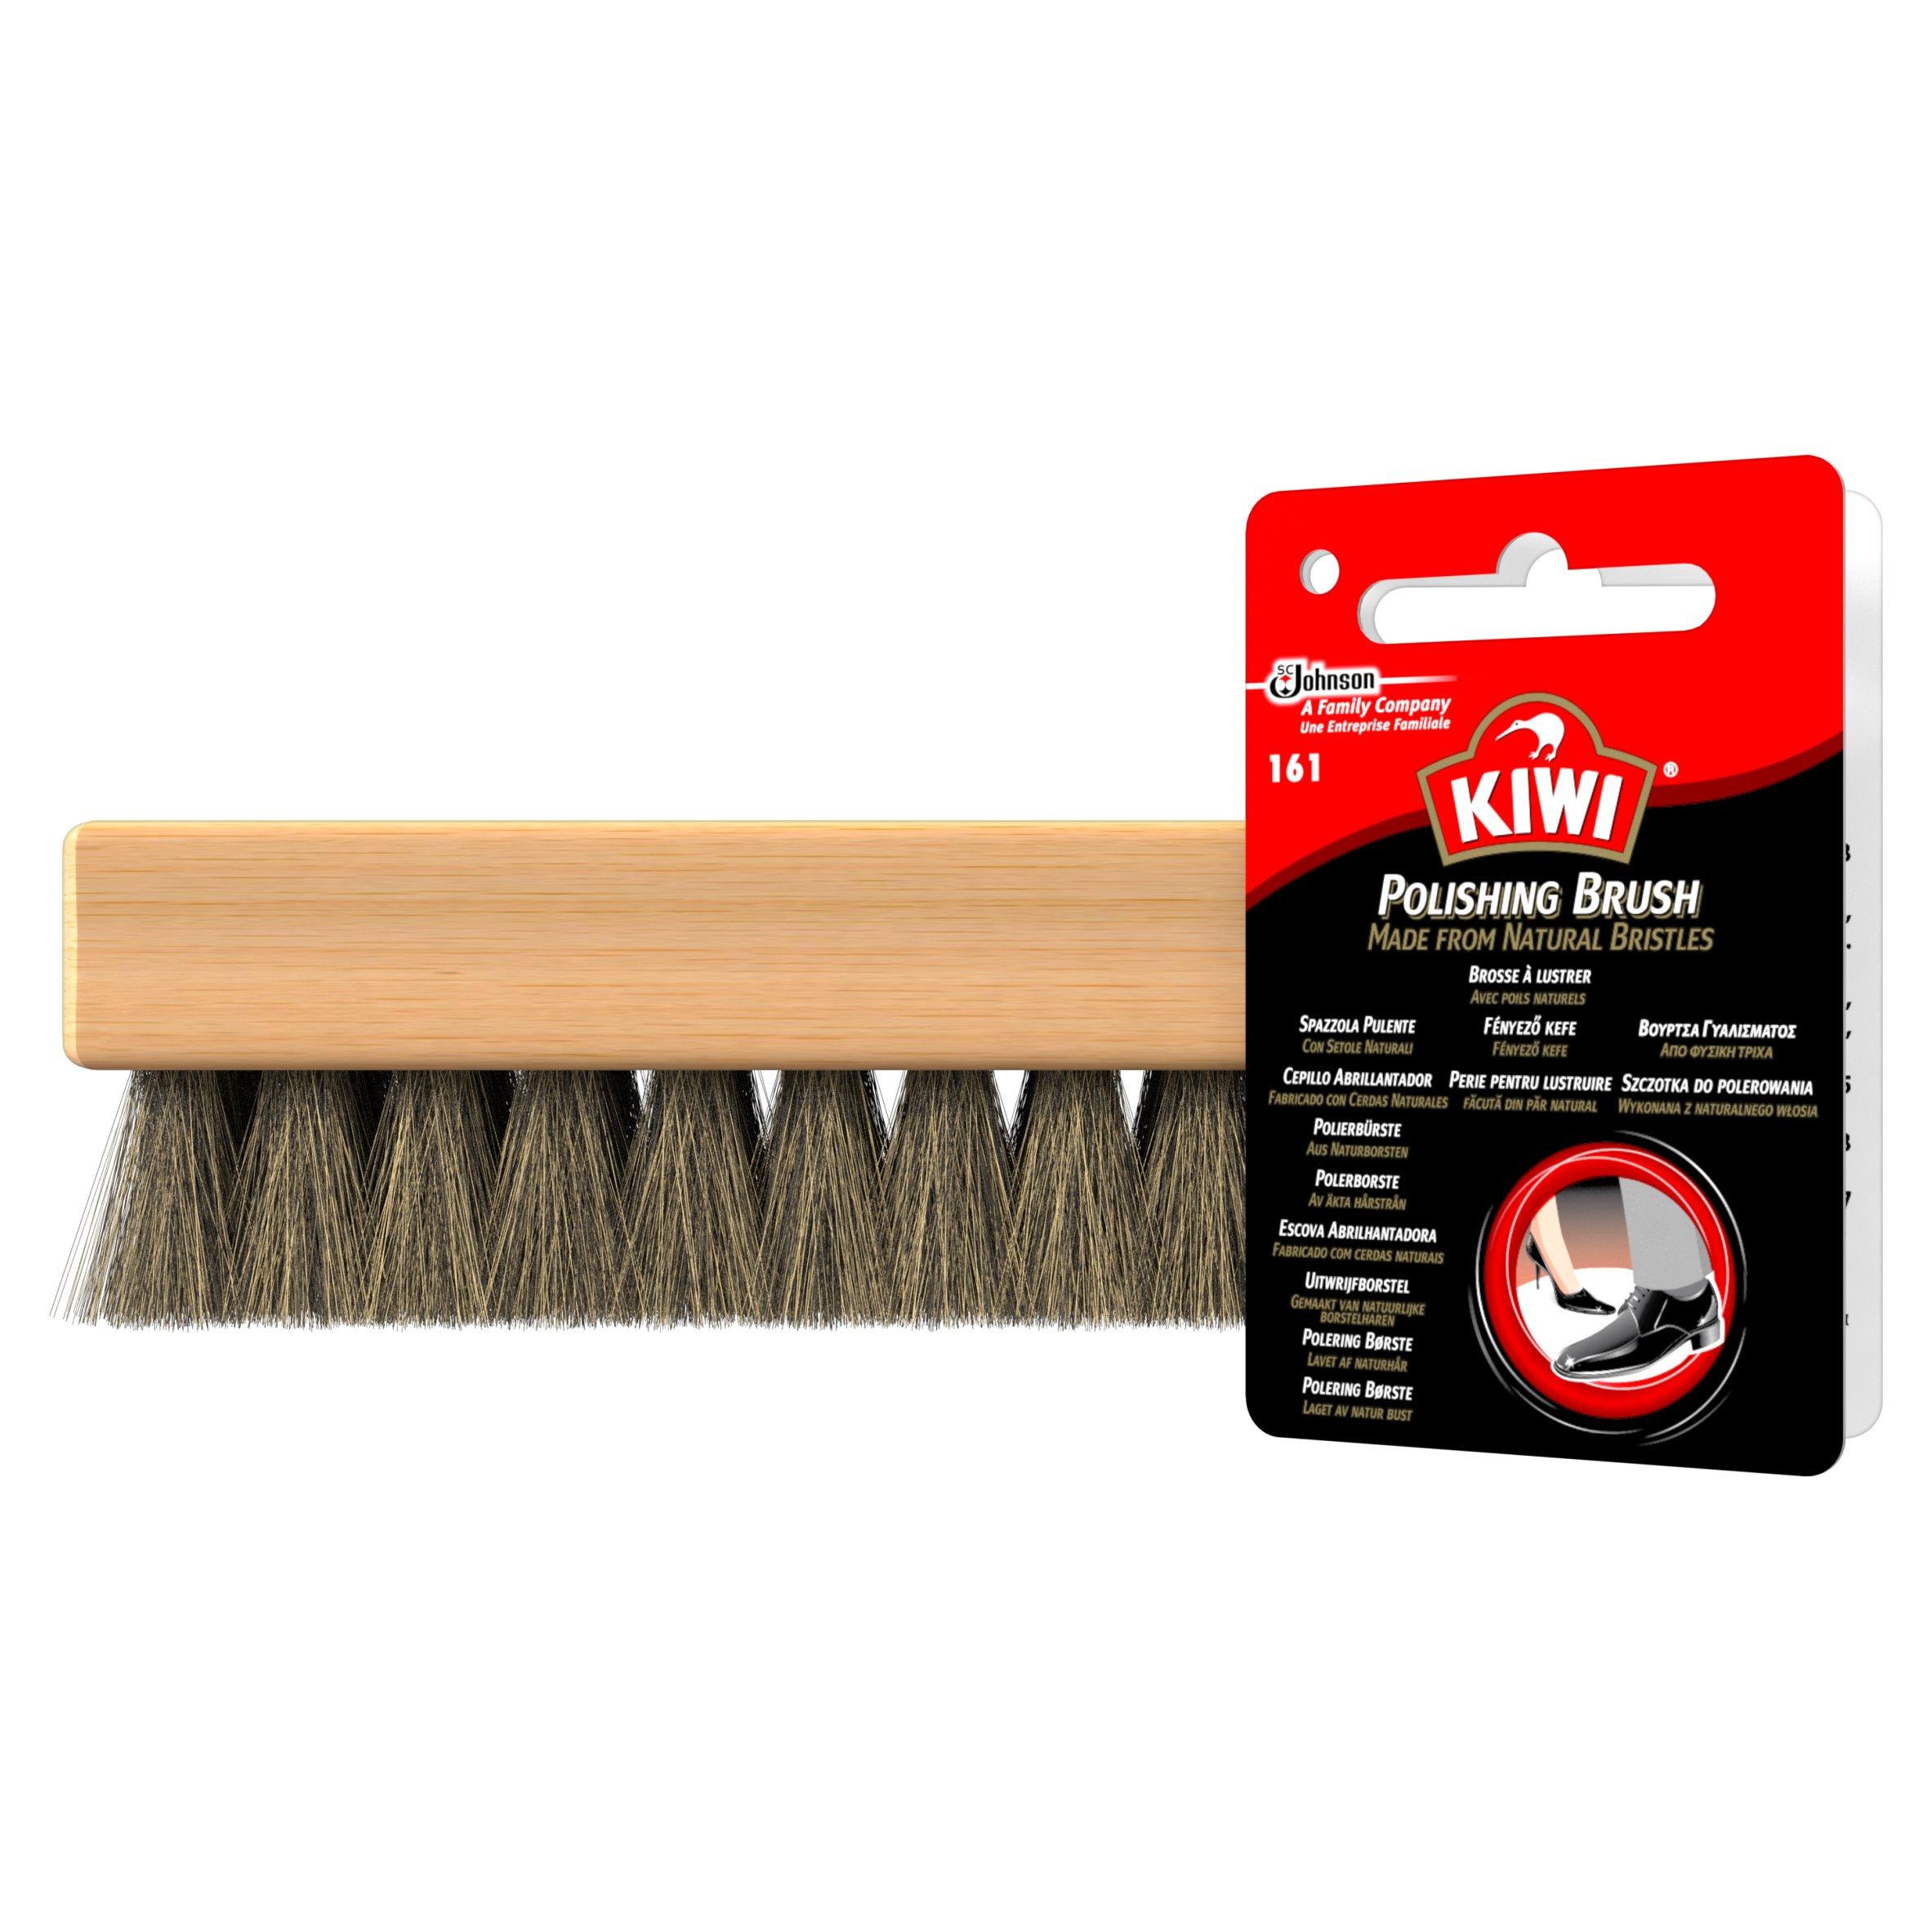 Kiwi Polishing Brush - Tesco Groceries